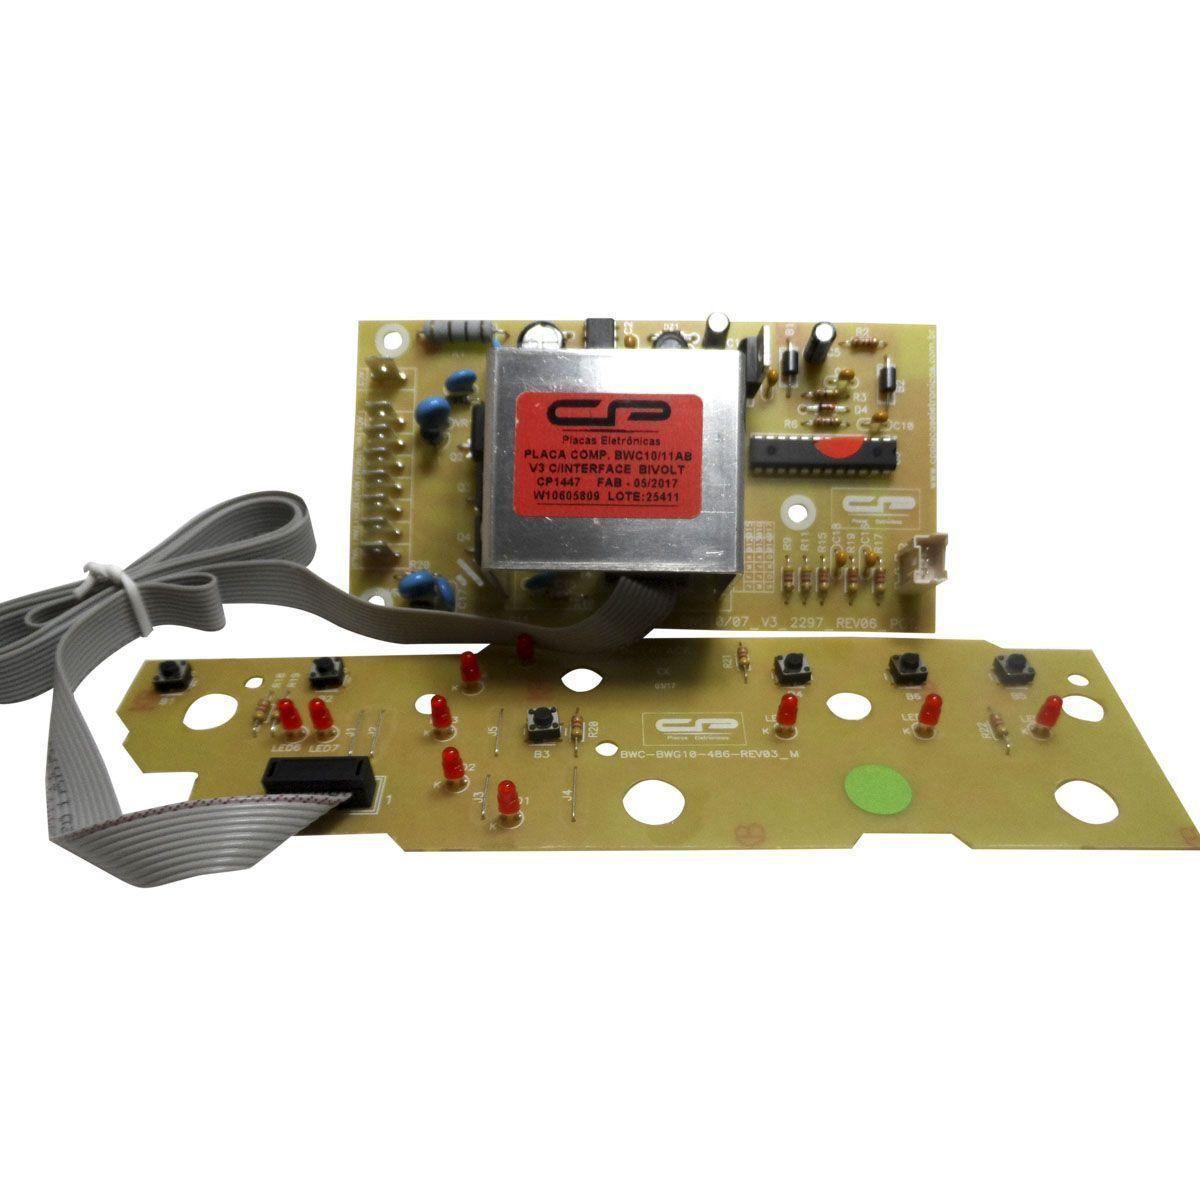 Placa Eletrônica Potência e Interface Lavadora Brastemp BWC10AB BWC11AB Versão 3 CP 1447